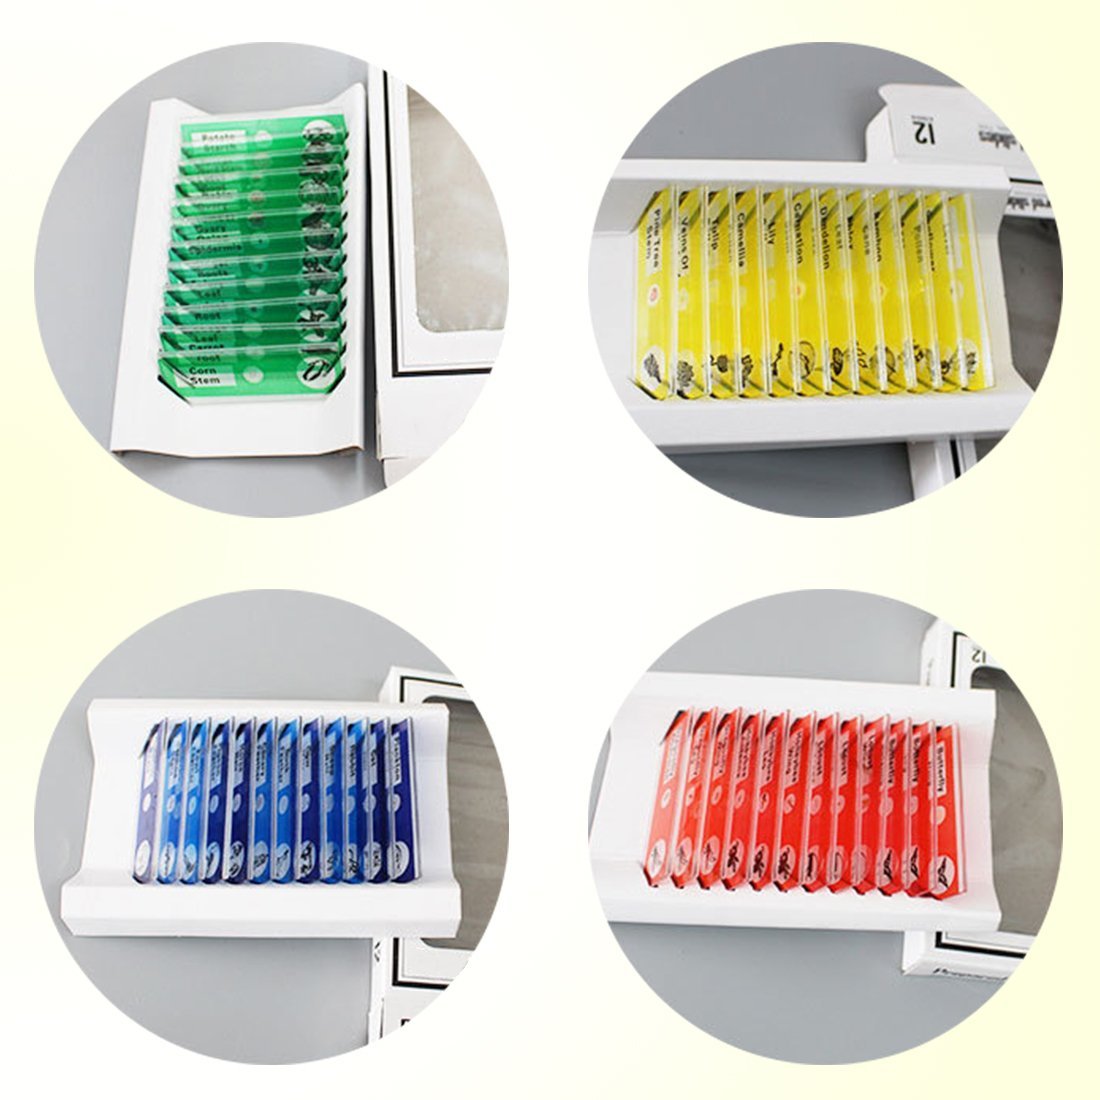 QIXINSTAR 48pcs Prepared Plastic Microscope Slides Biological Specimen with 4 Boxes for Children Student Enlighten Education